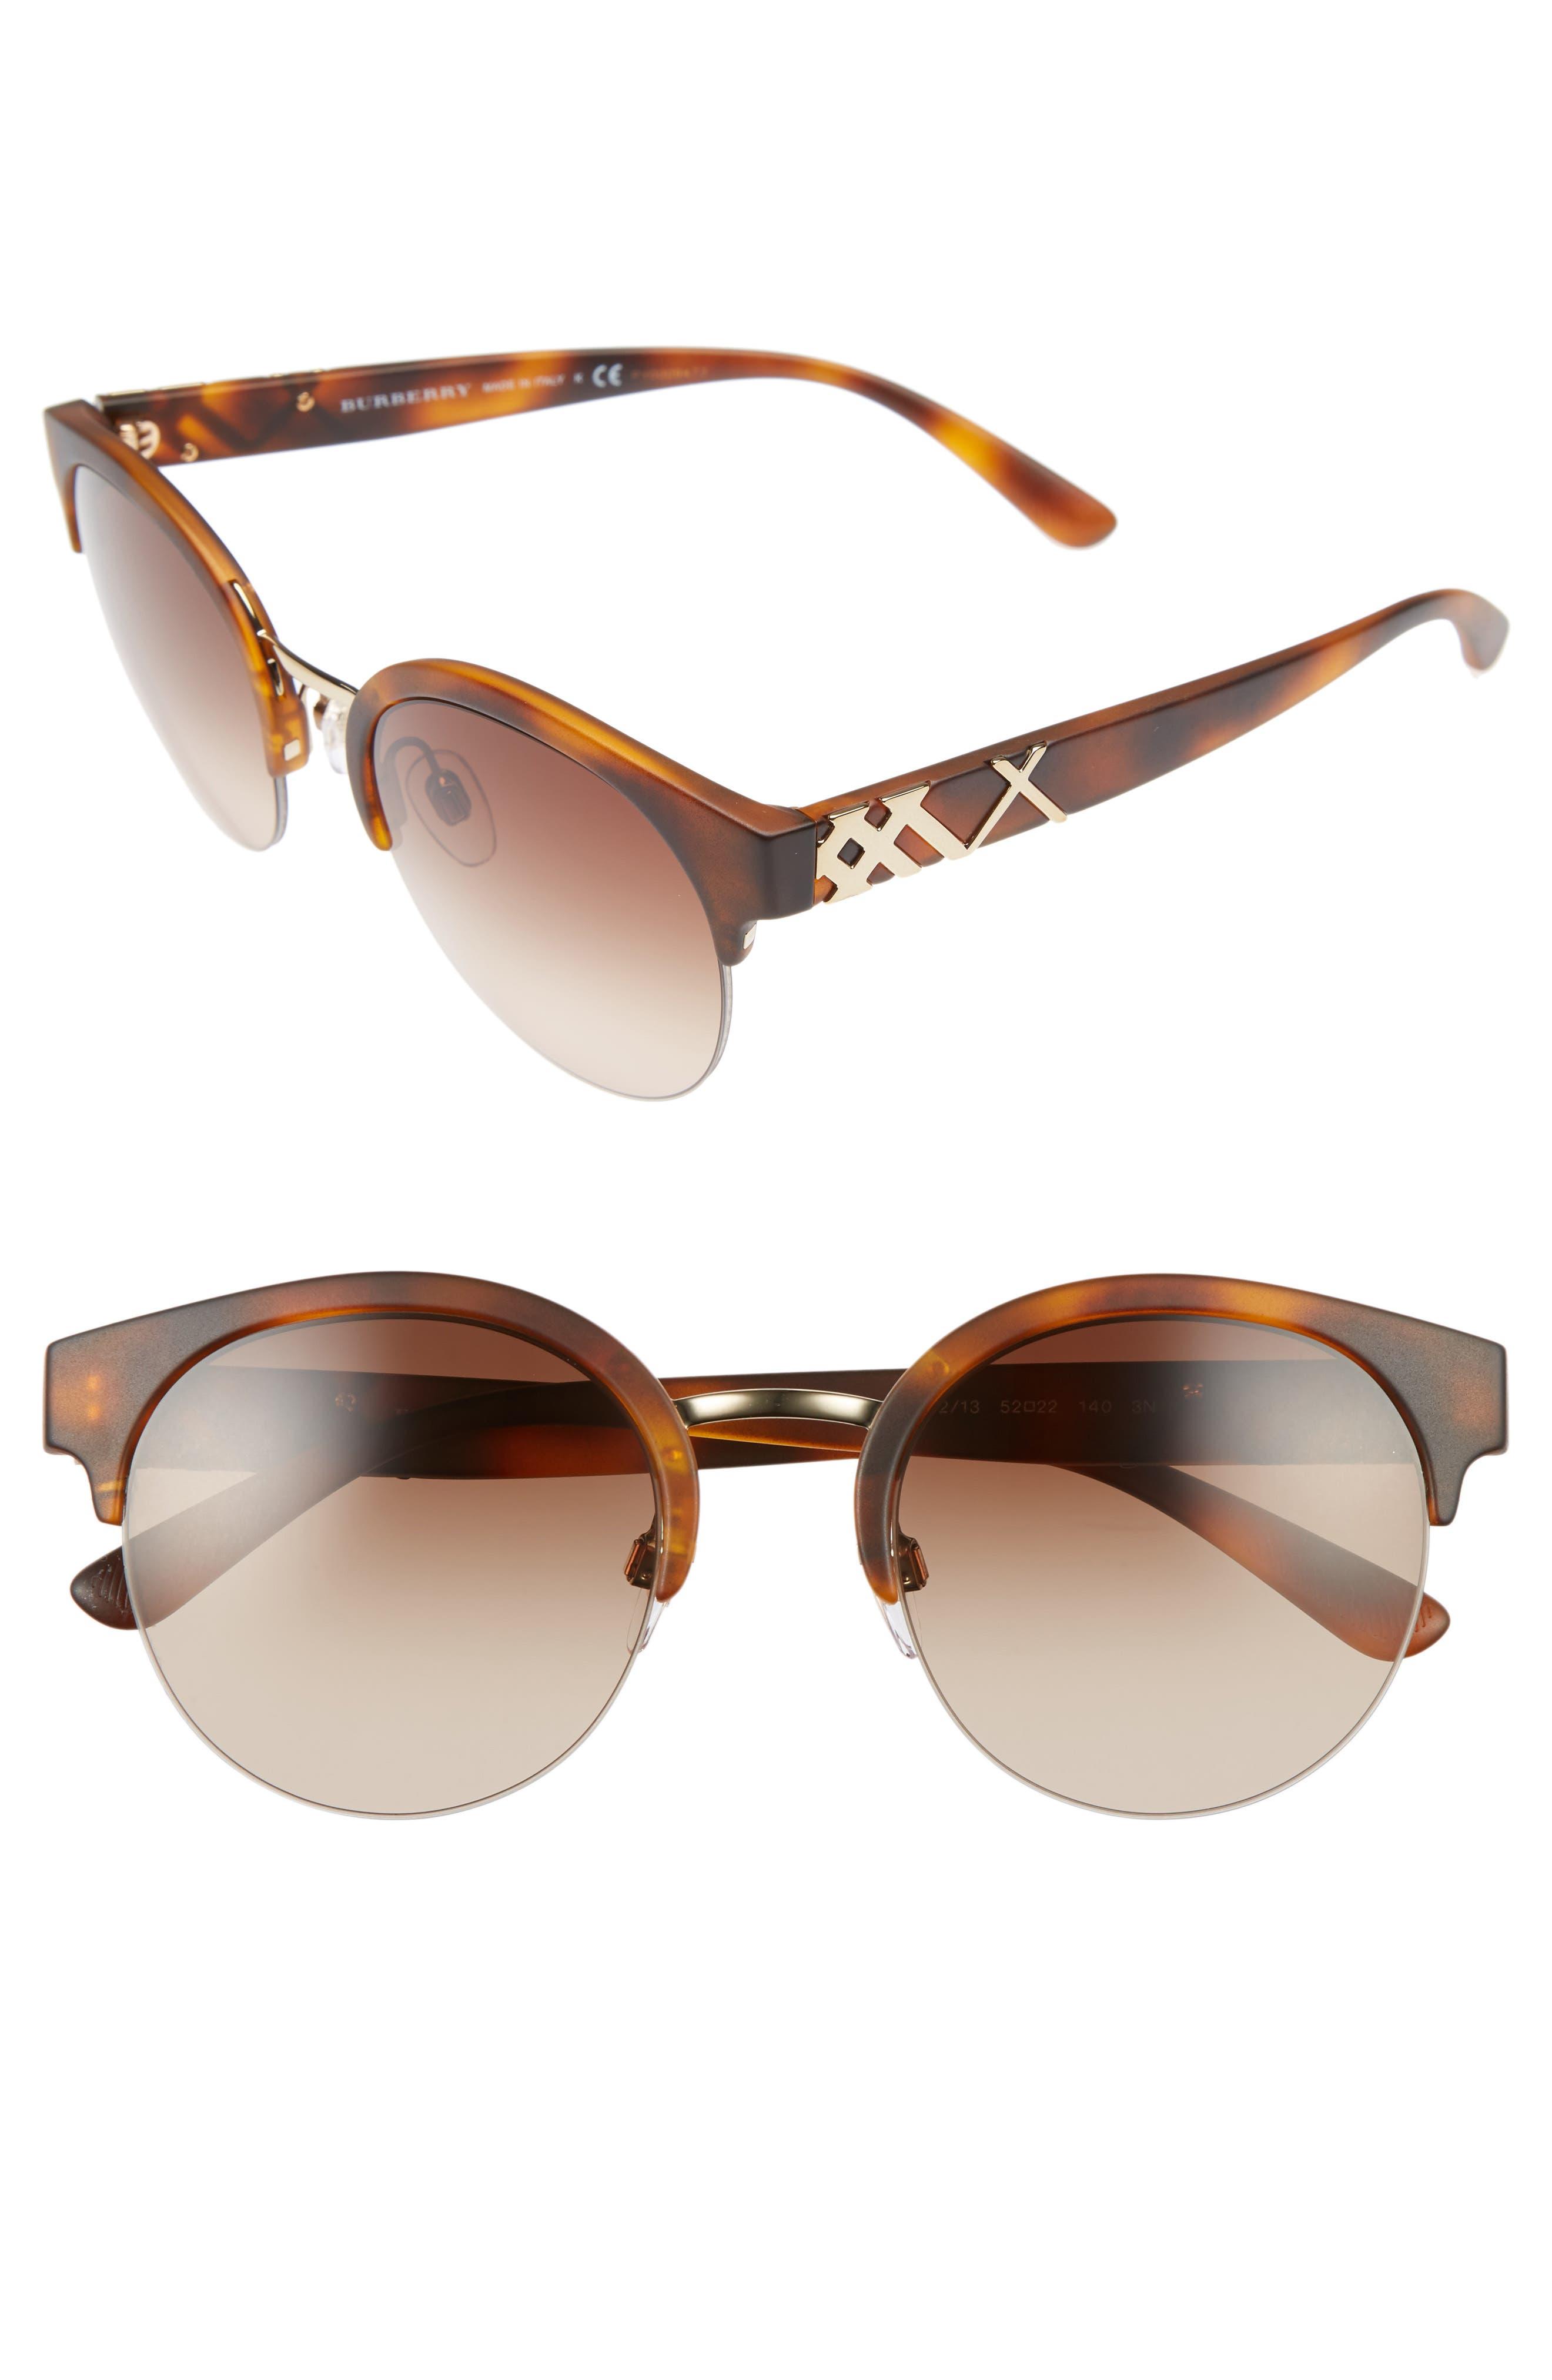 52mm Gradient Semi Rimless Sunglasses,                             Main thumbnail 2, color,